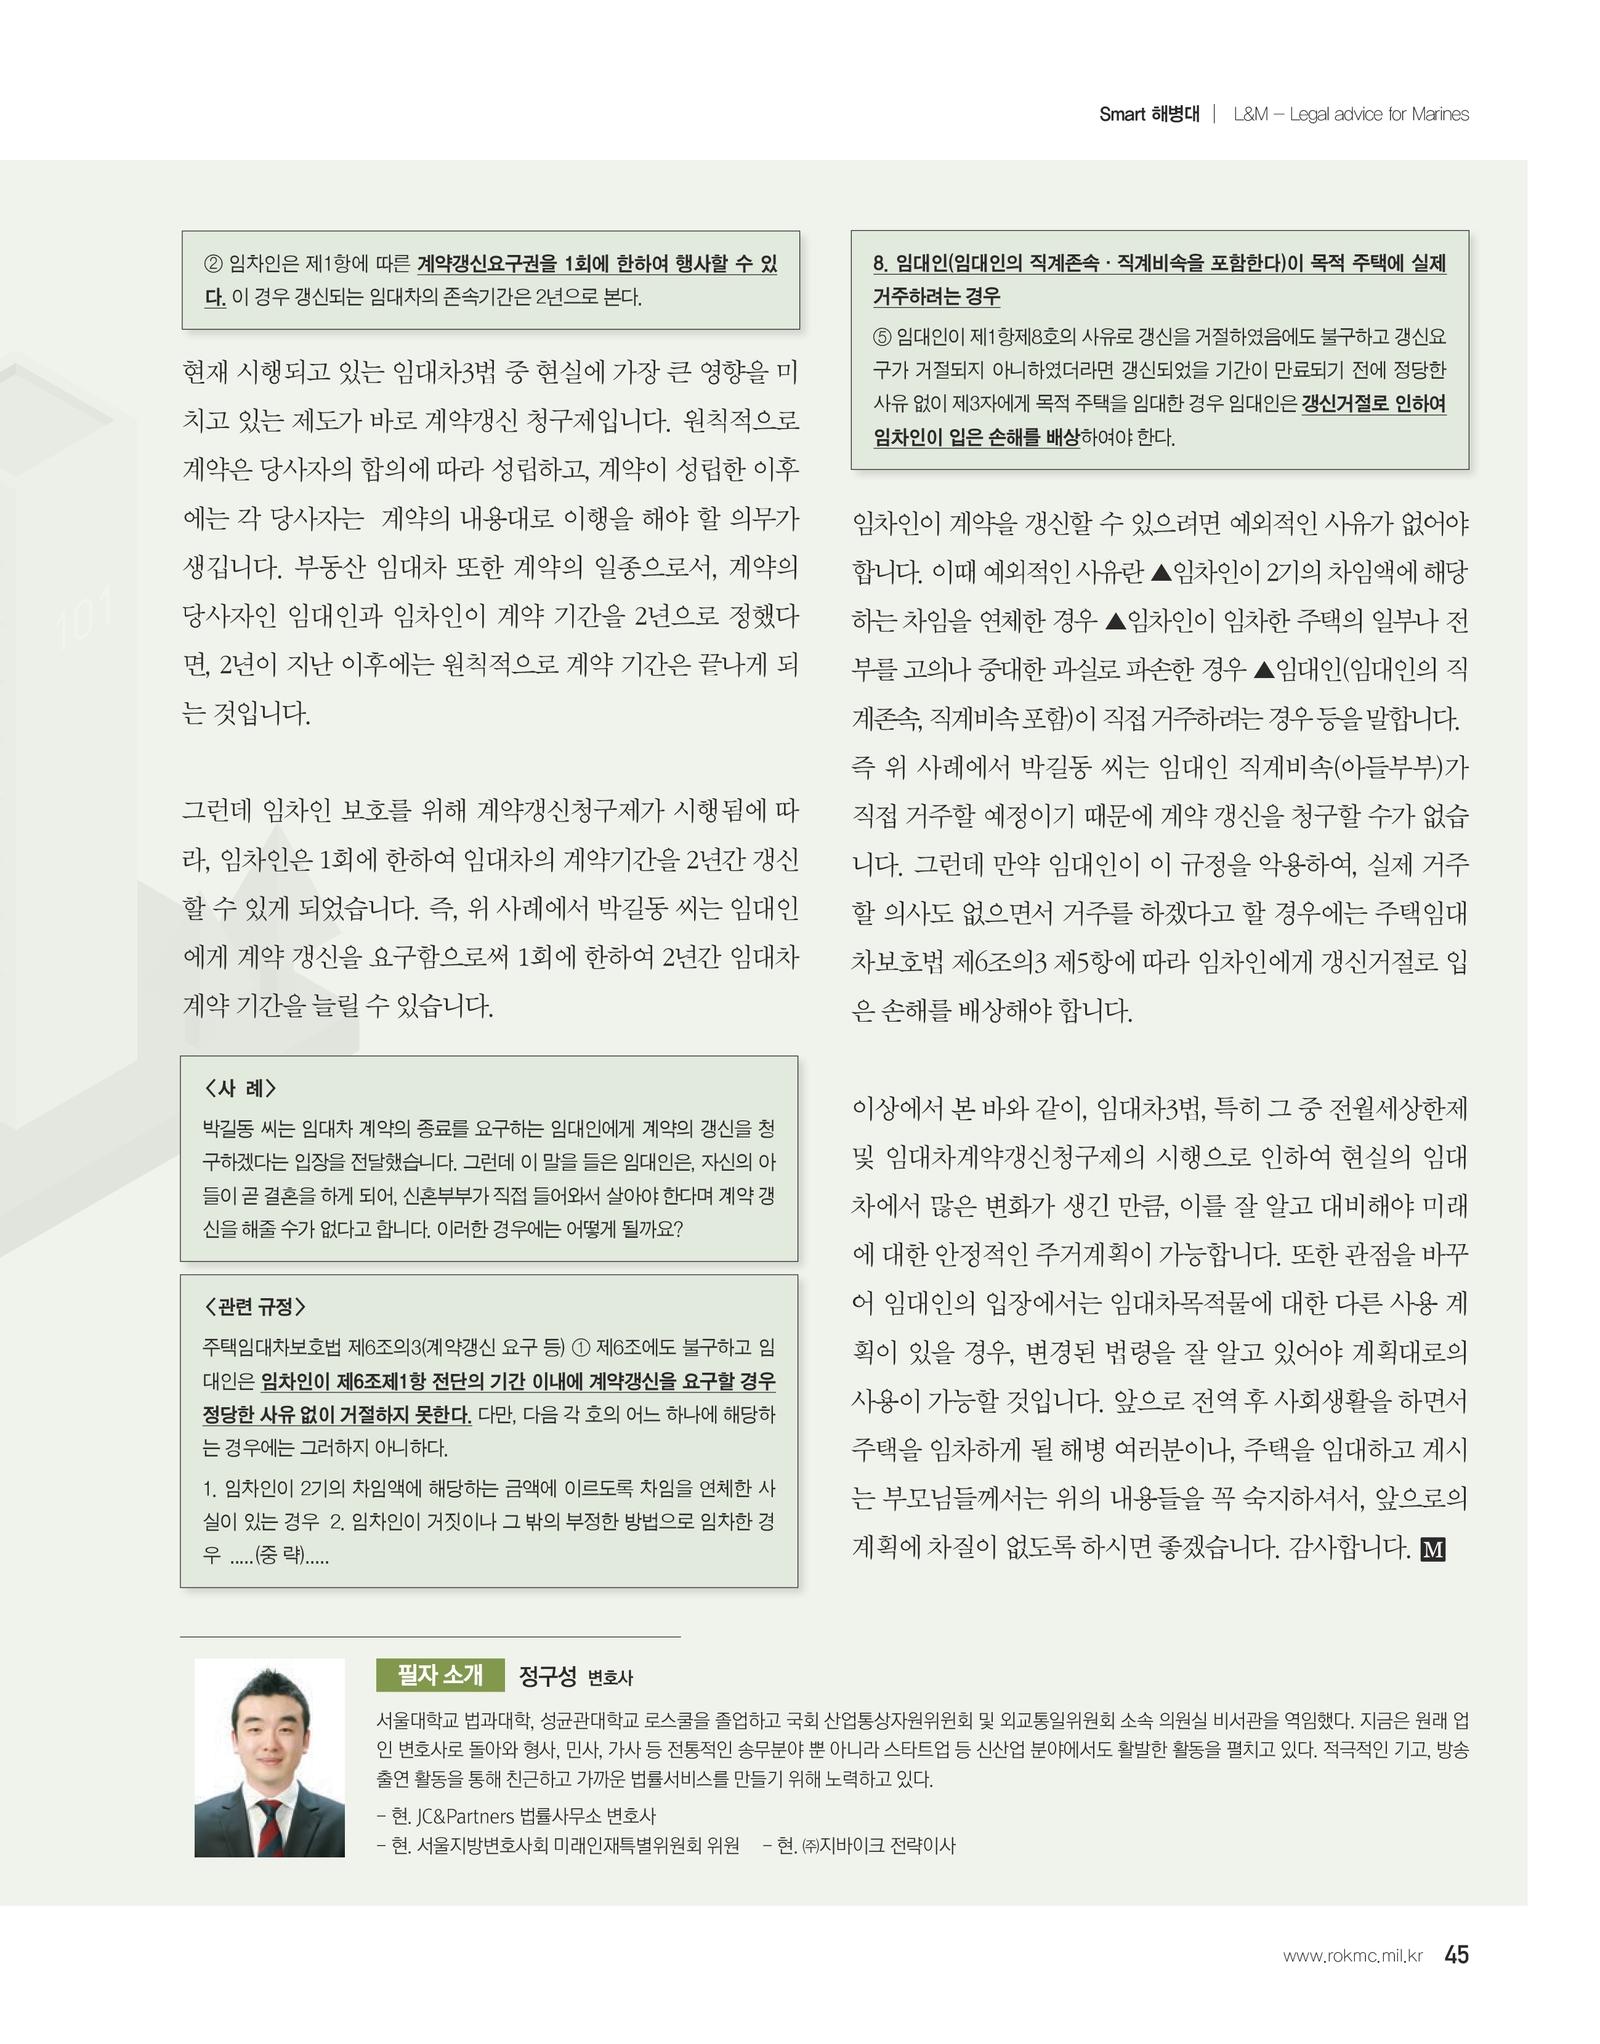 page-134083-0047.jpg